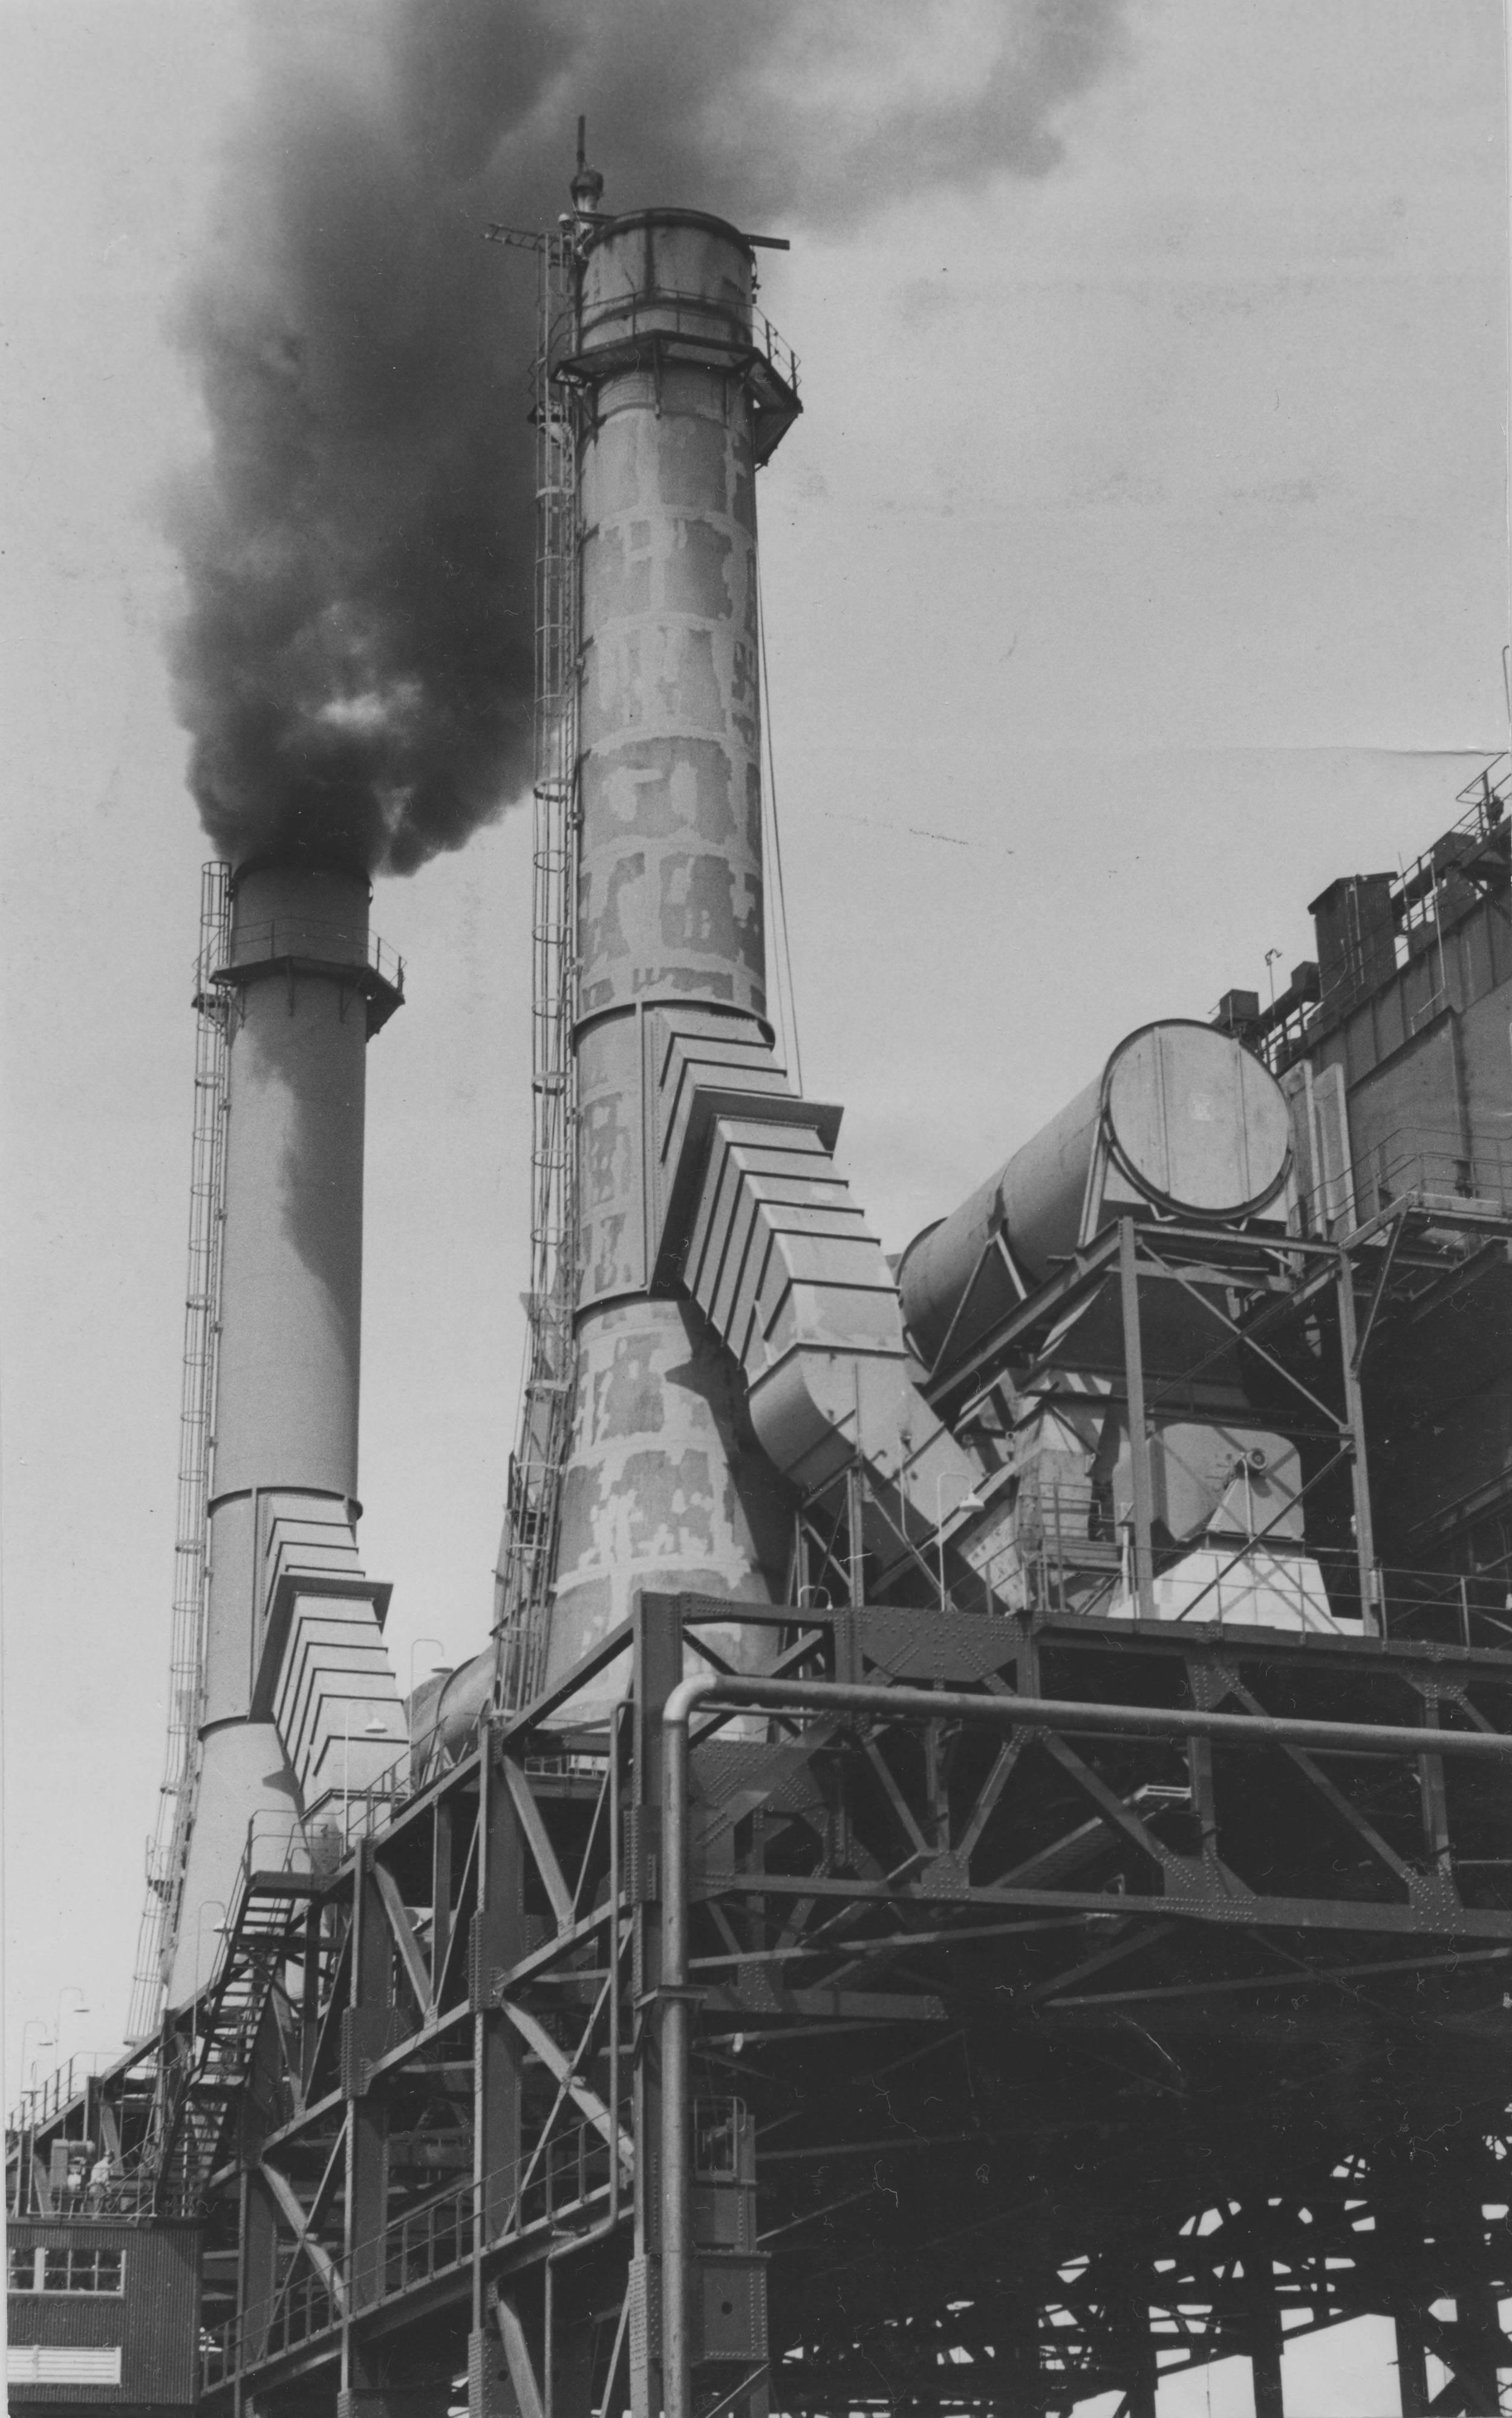 Jones_and_Laughlin_Steel_1961.jpg